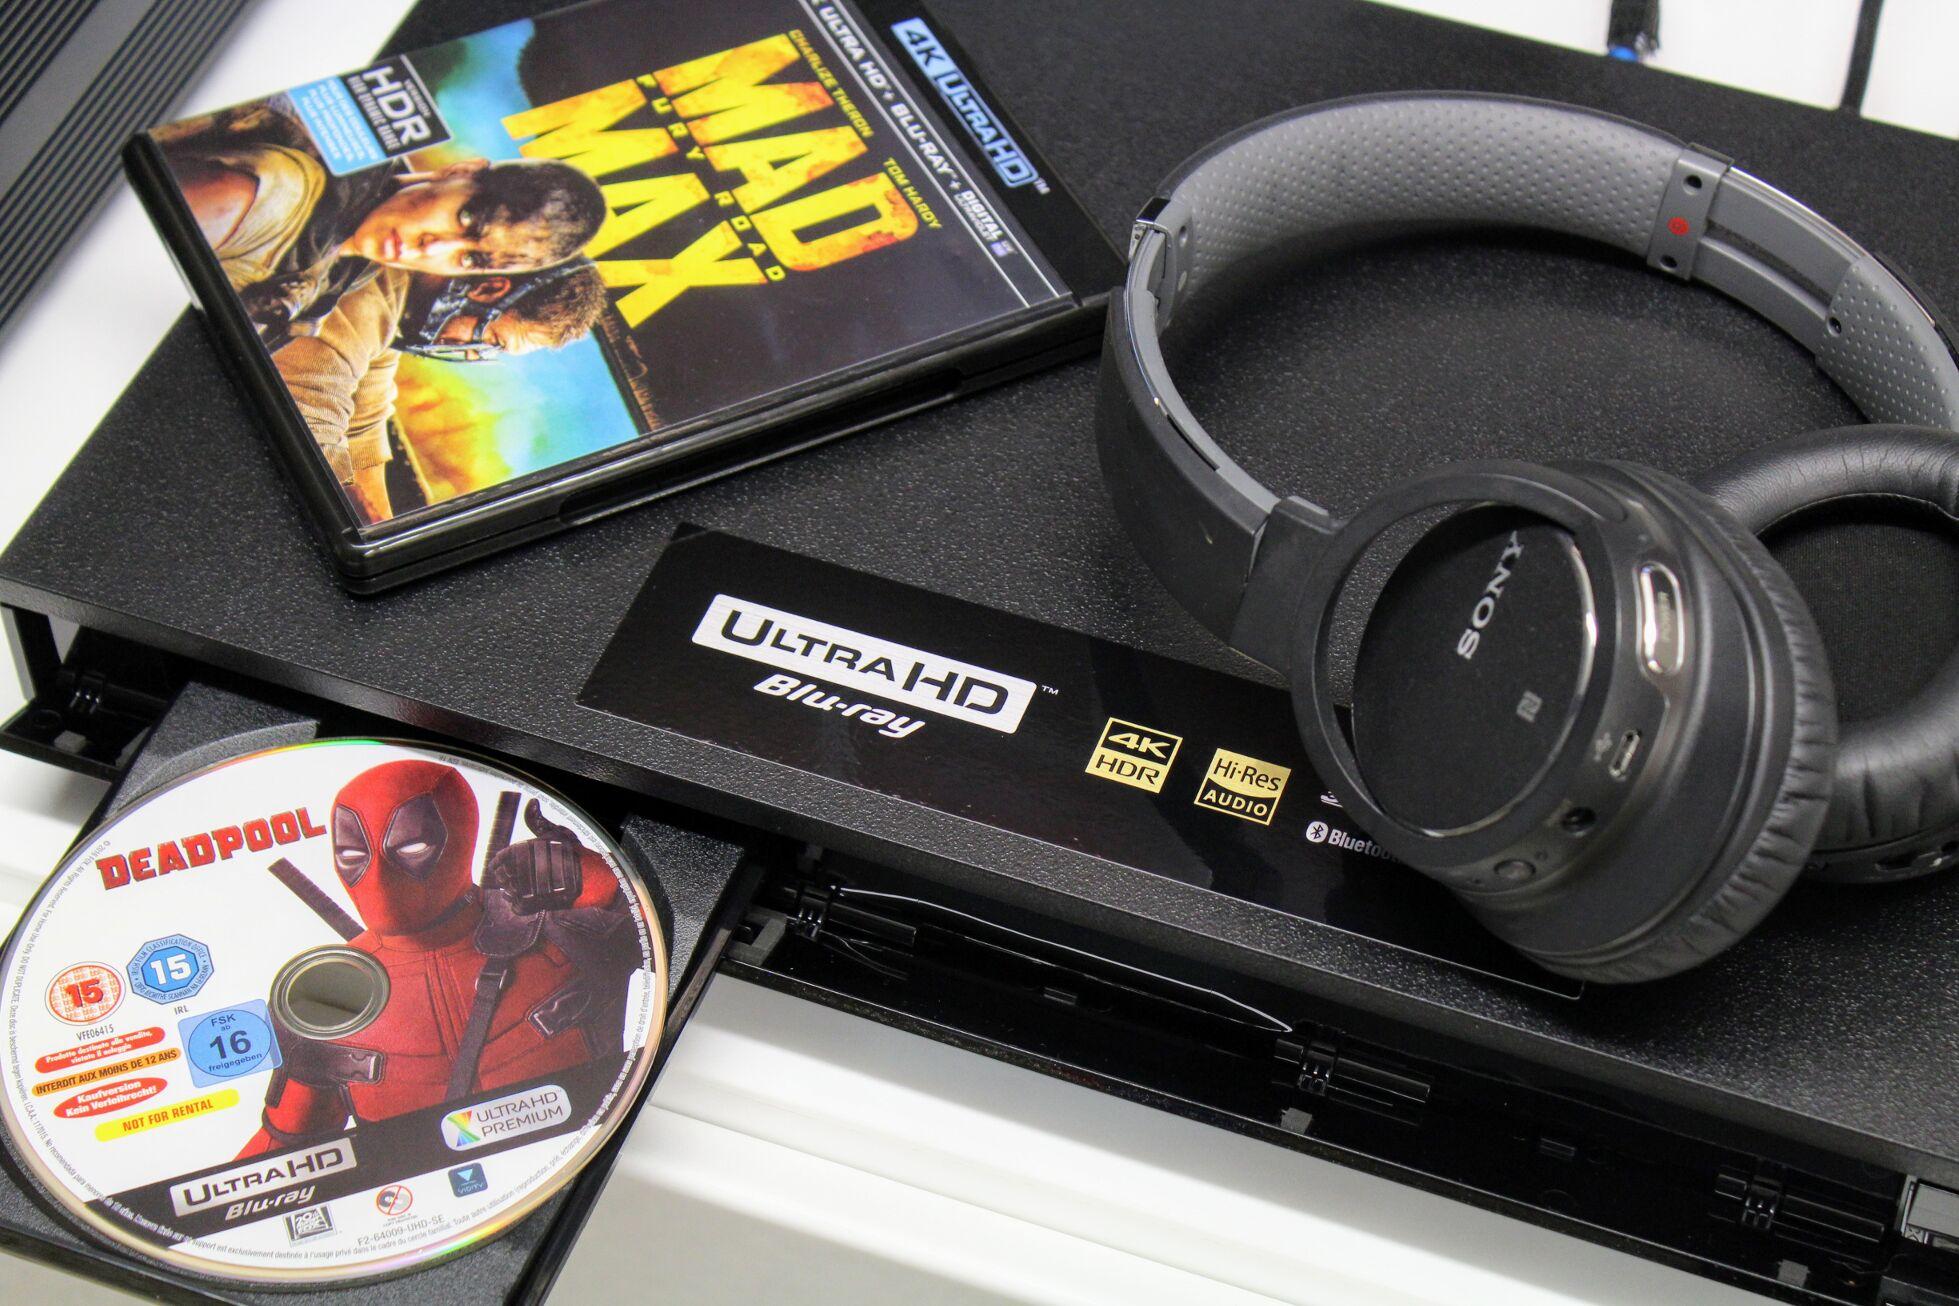 Review: Sony UBP-X800 - Son-Vidéo com: blog